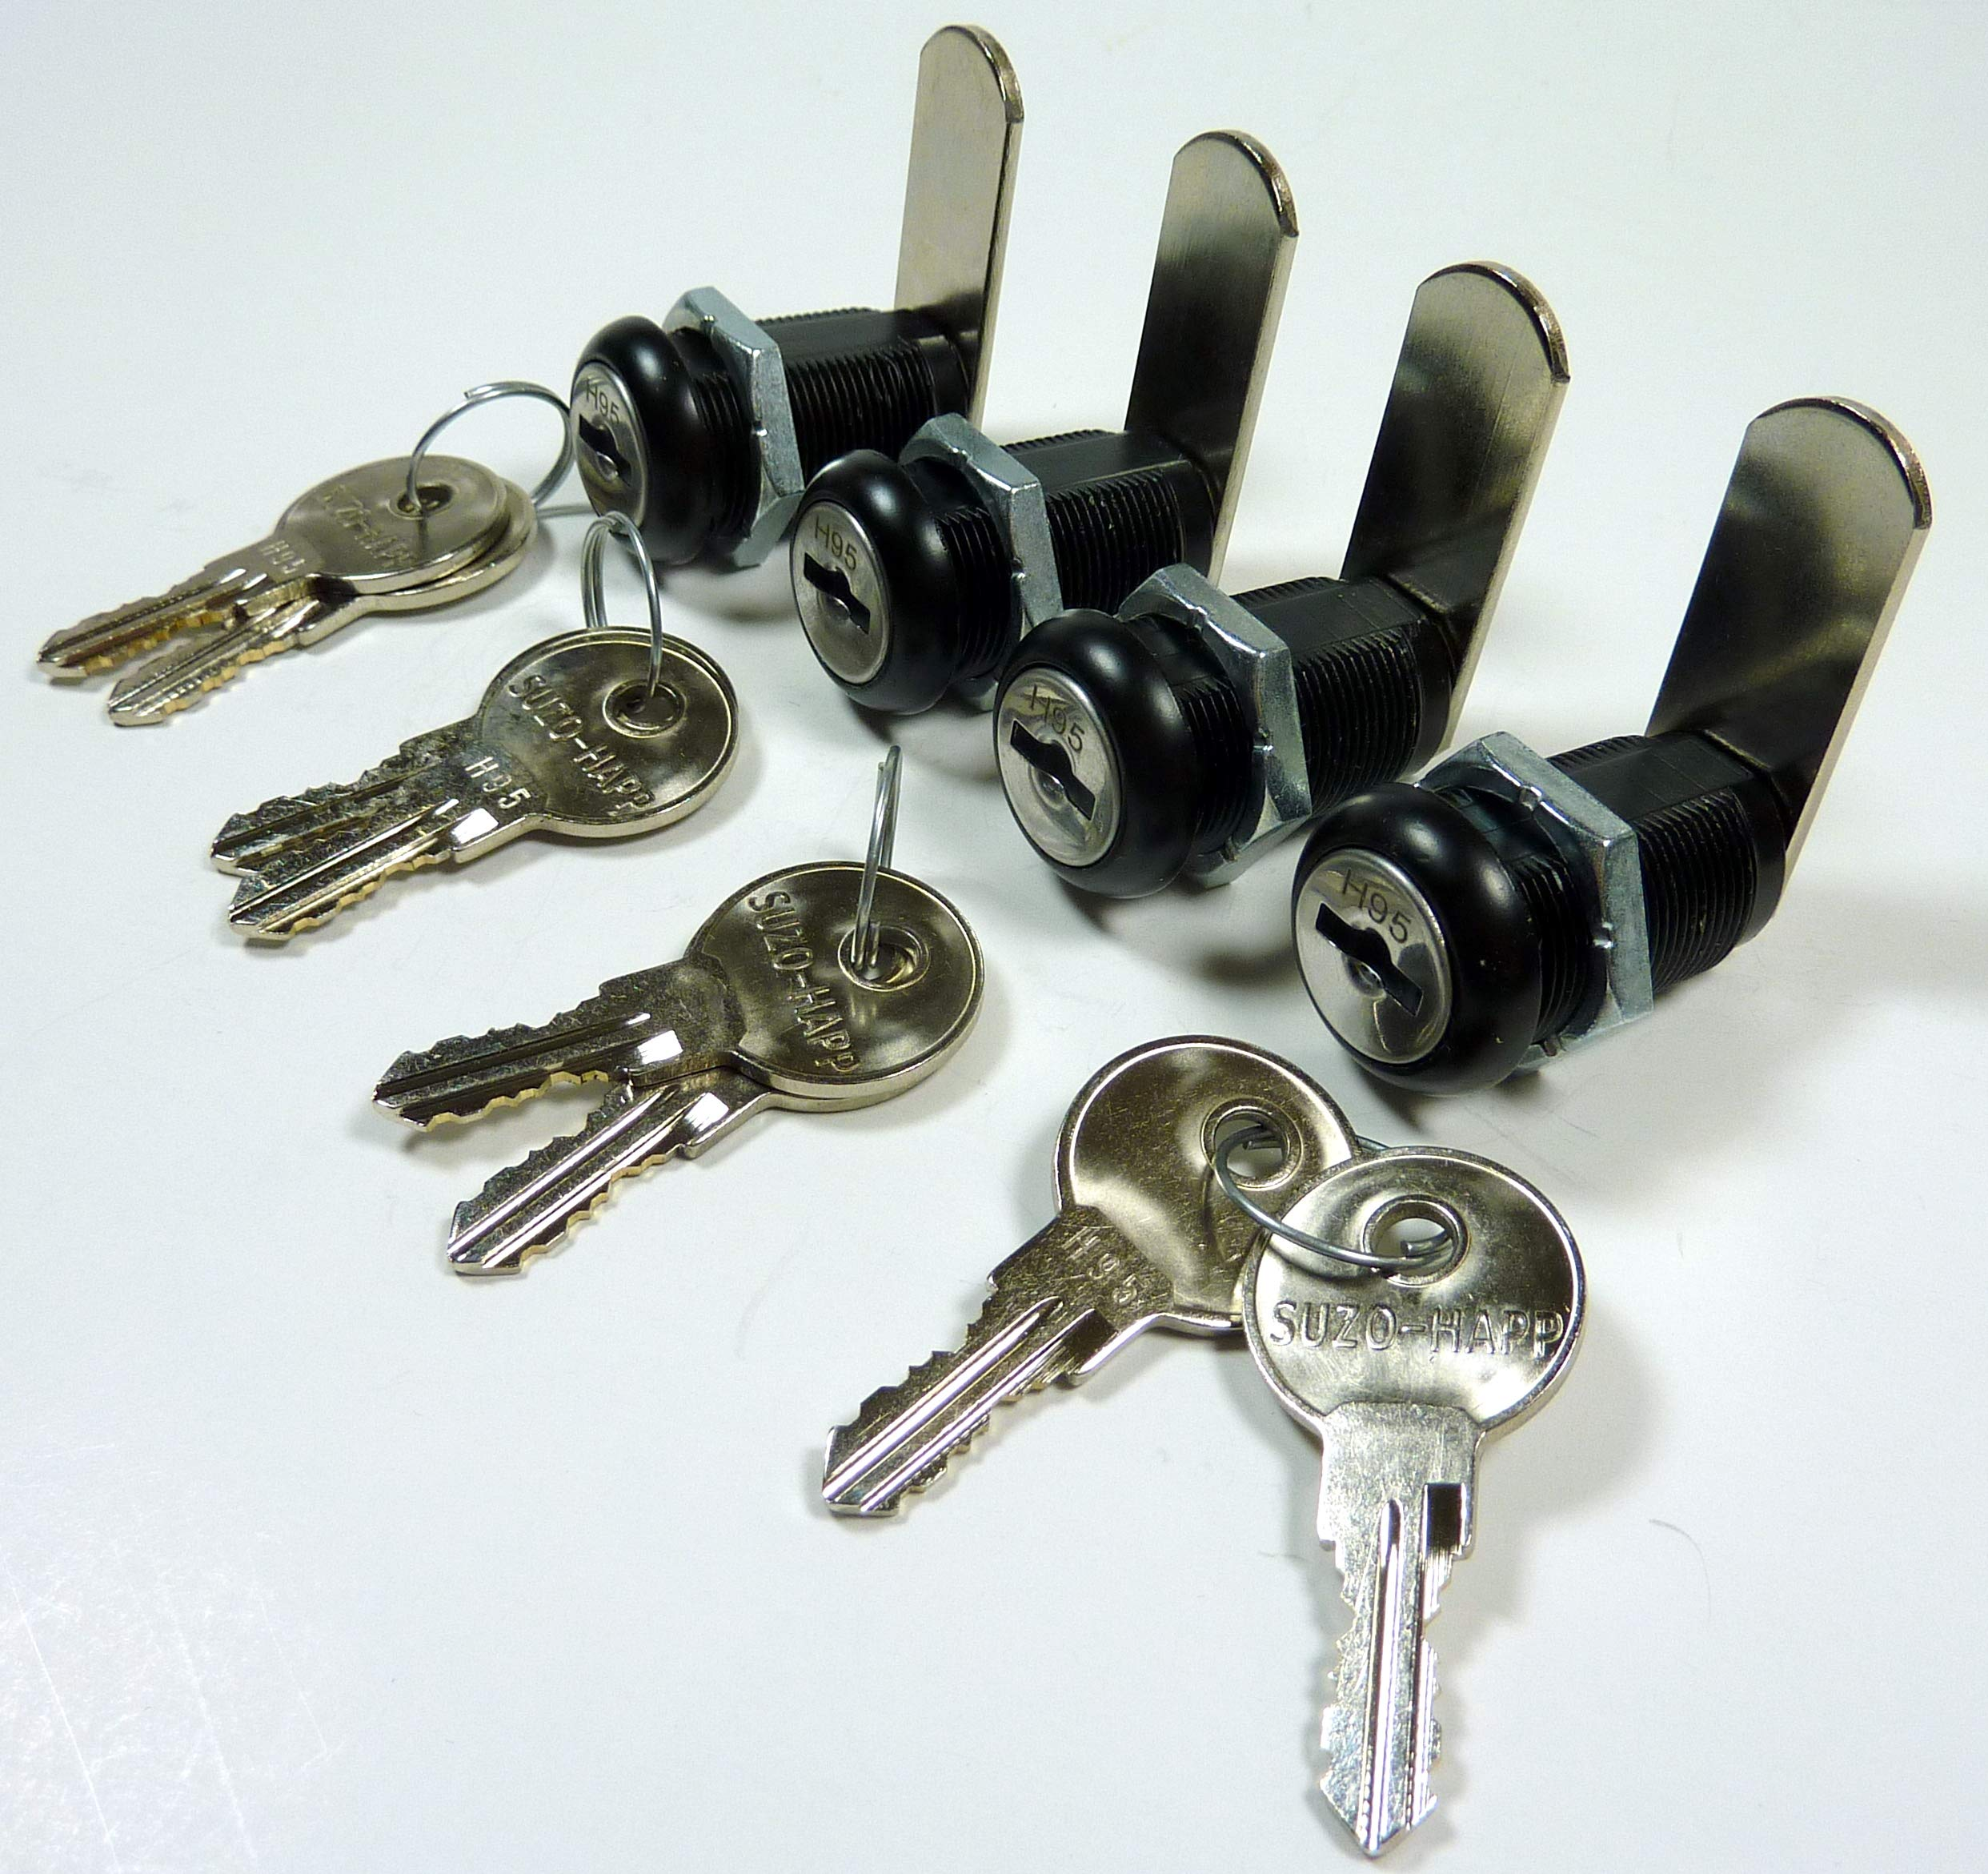 4-Pk 1-1/8'' Black Cam Lock Double Bitted Tumbler Keyed Alike 2 Keys Cabinets, Drawers, Lockers